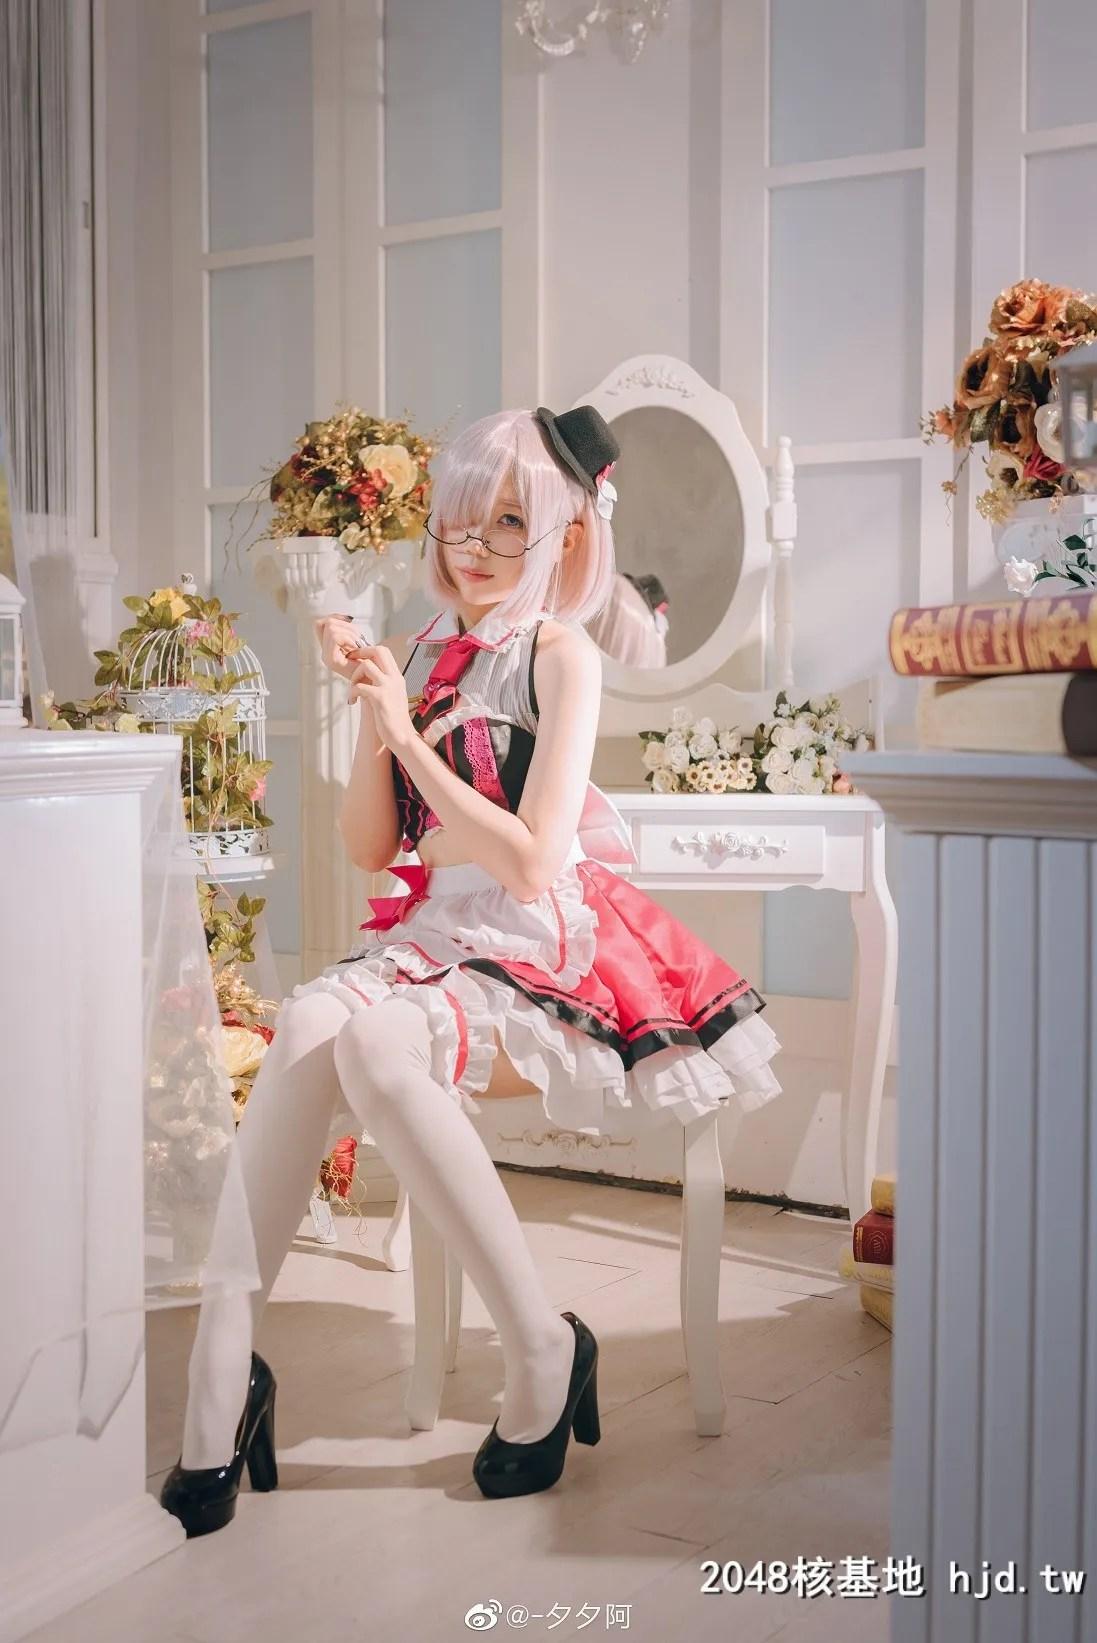 Fate/GrandOrder玛修·基列莱特@-夕夕阿 (9P)插图(4)